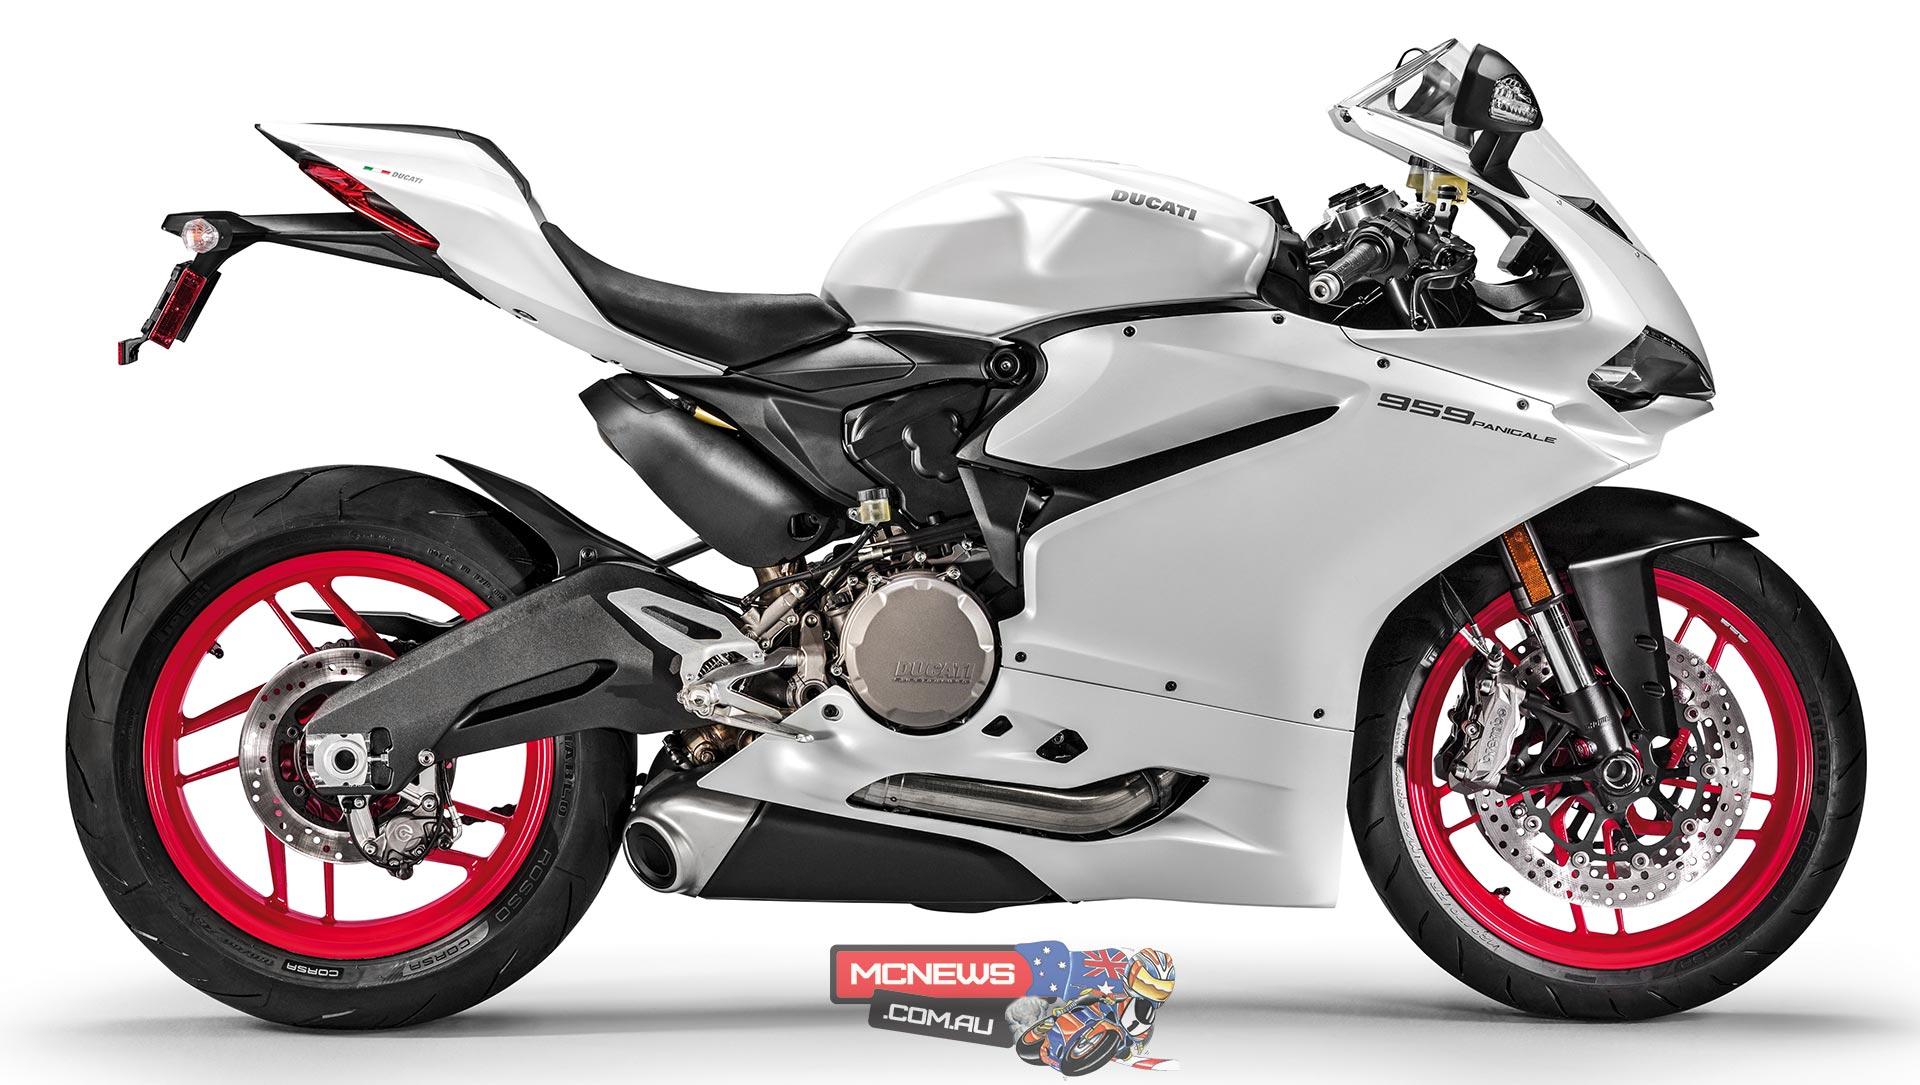 [Imagem: Ducati-959-Panigale-29-22-959-PANIGALE-Non-Euro4.jpg]